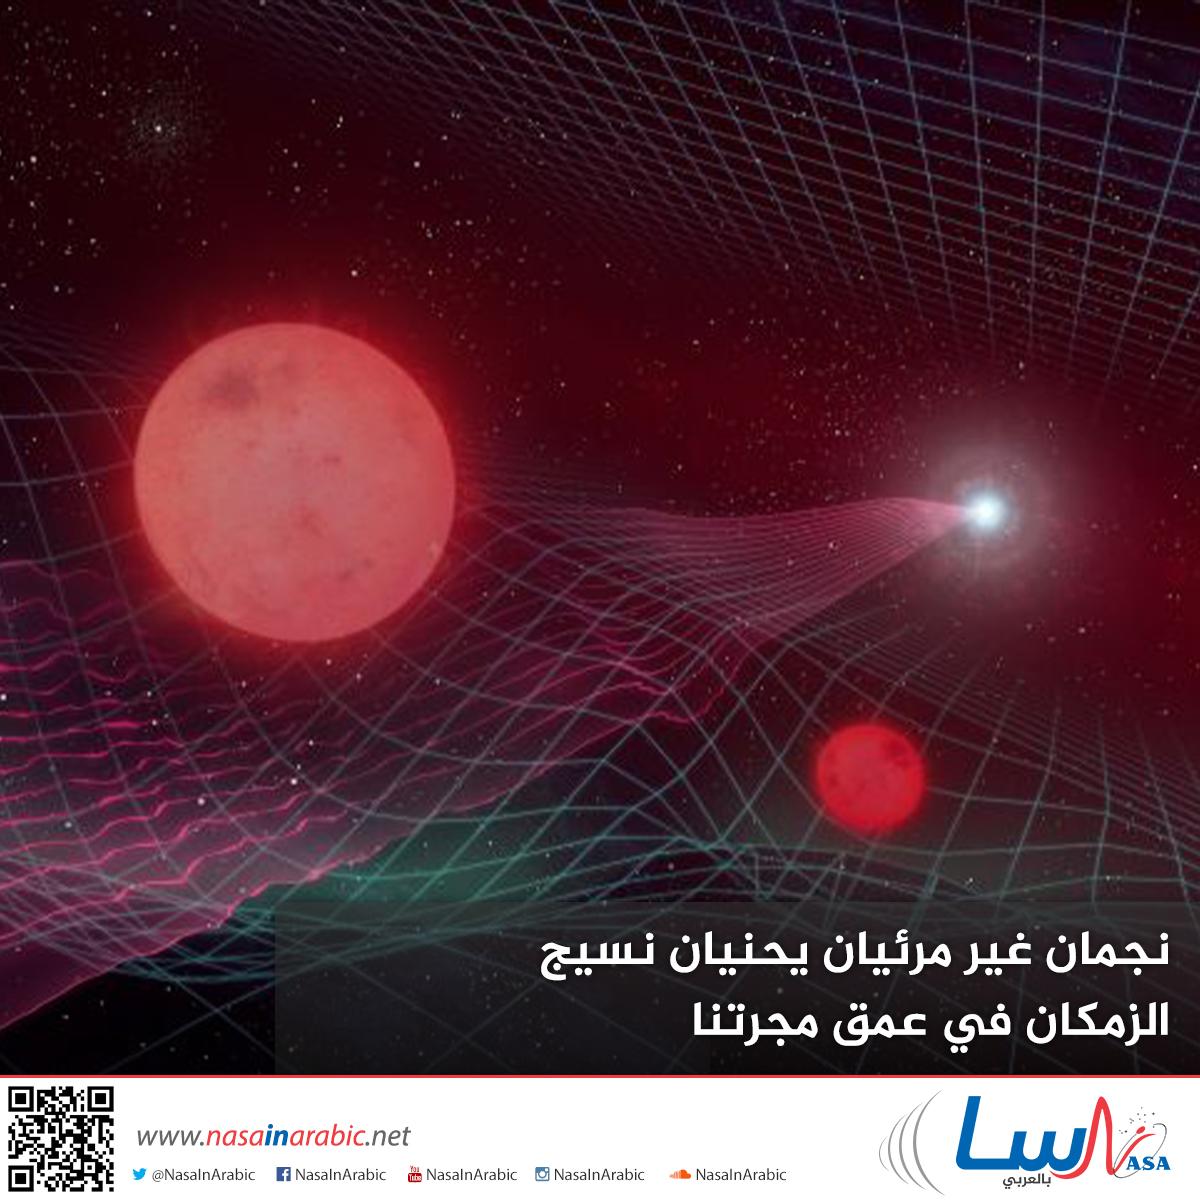 نجمان غير مرئيان يحنيان نسيج الزمكان في عمق مجرتنا